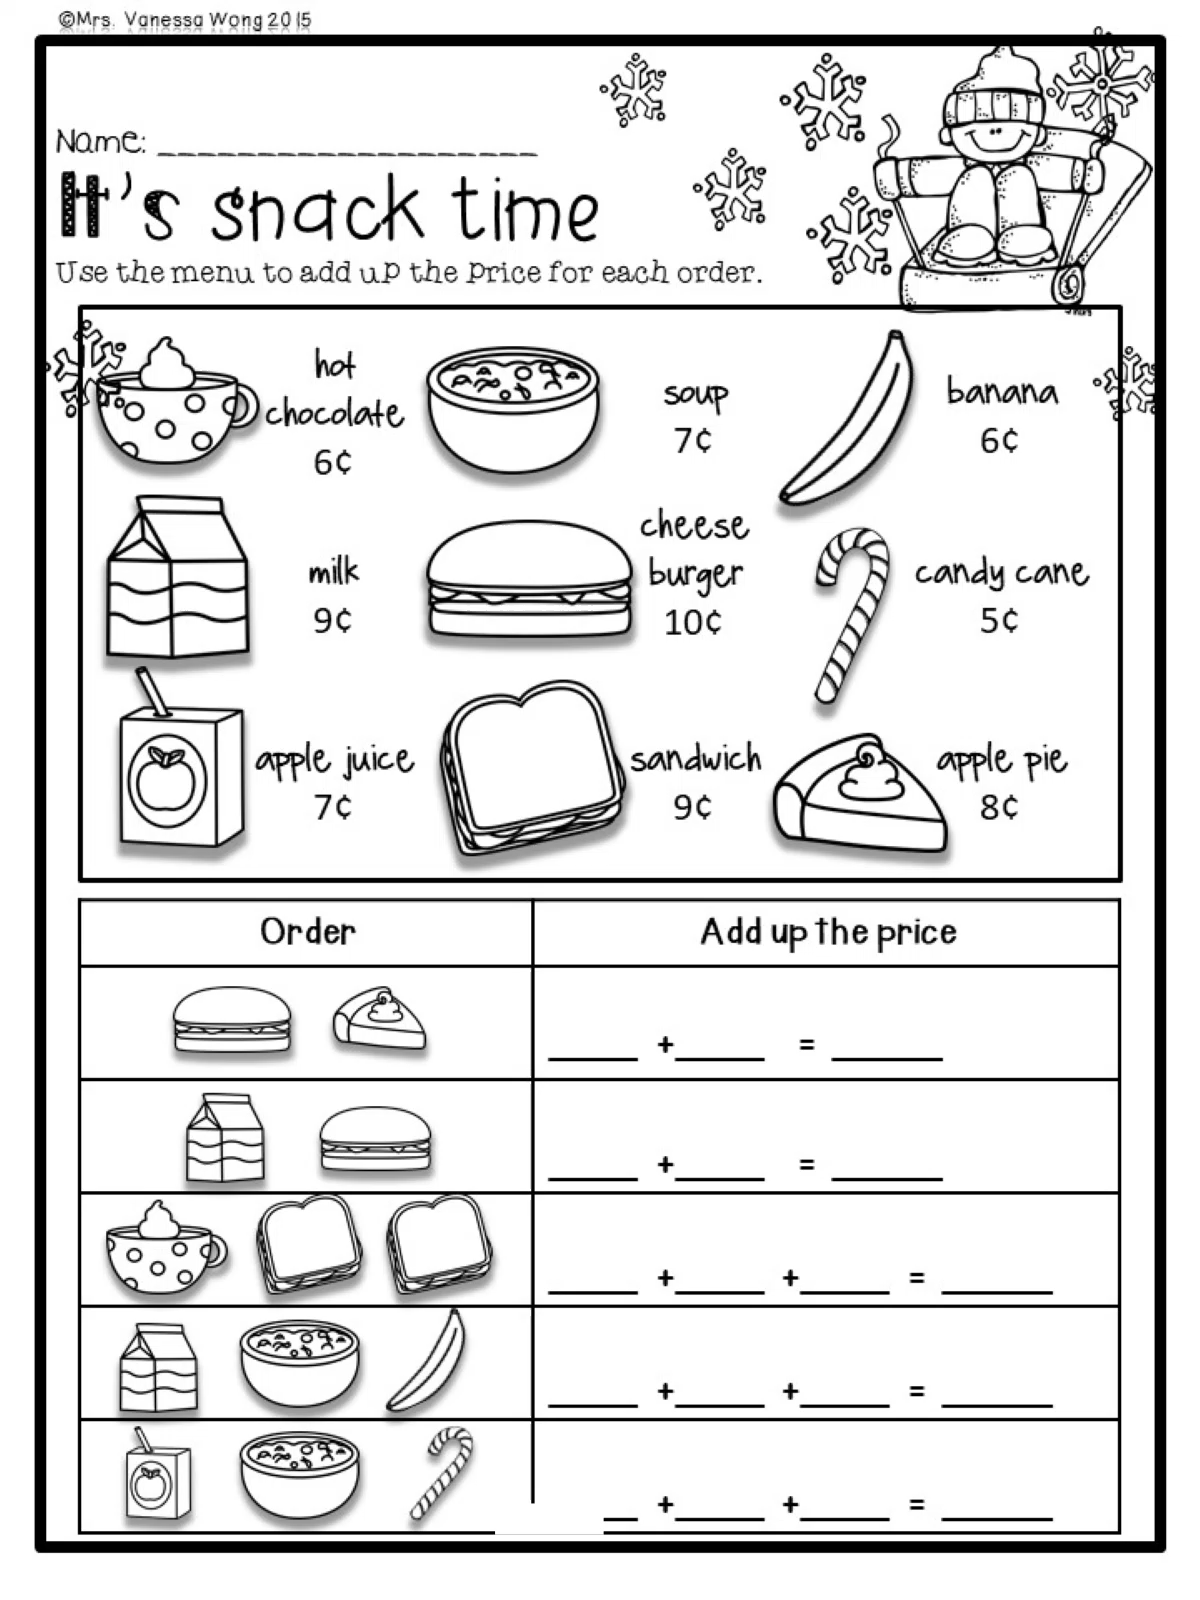 Winter Activities And Worksheets For First Grade Math Literacy No Prep Video 1st Grade Math Worksheets First Grade Math Worksheets Money Math Worksheets [ 1600 x 1200 Pixel ]